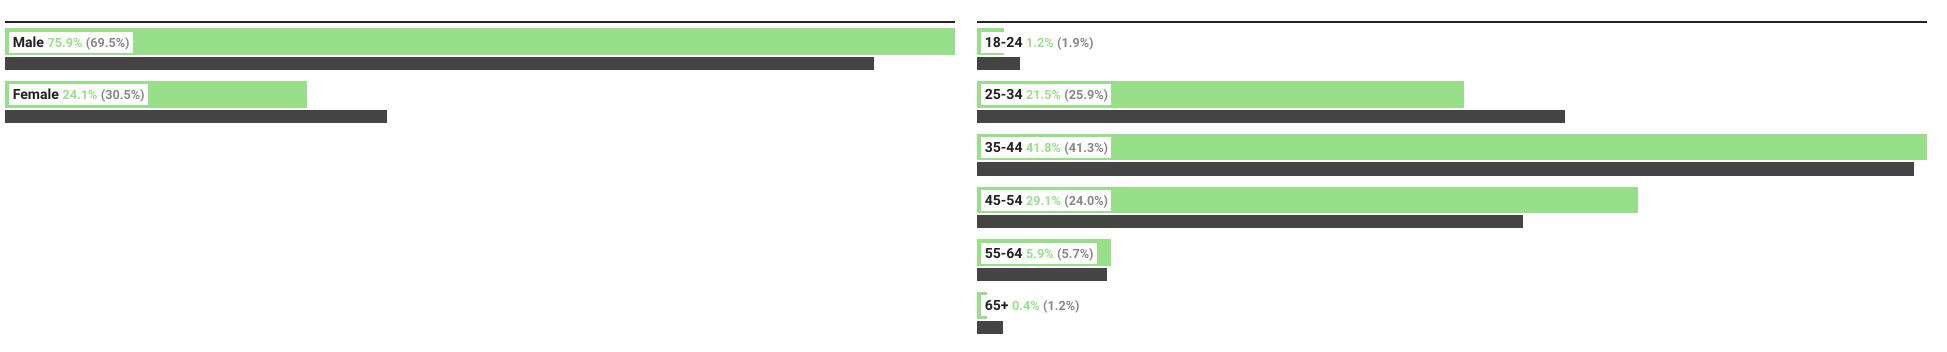 Demographics of CIOs